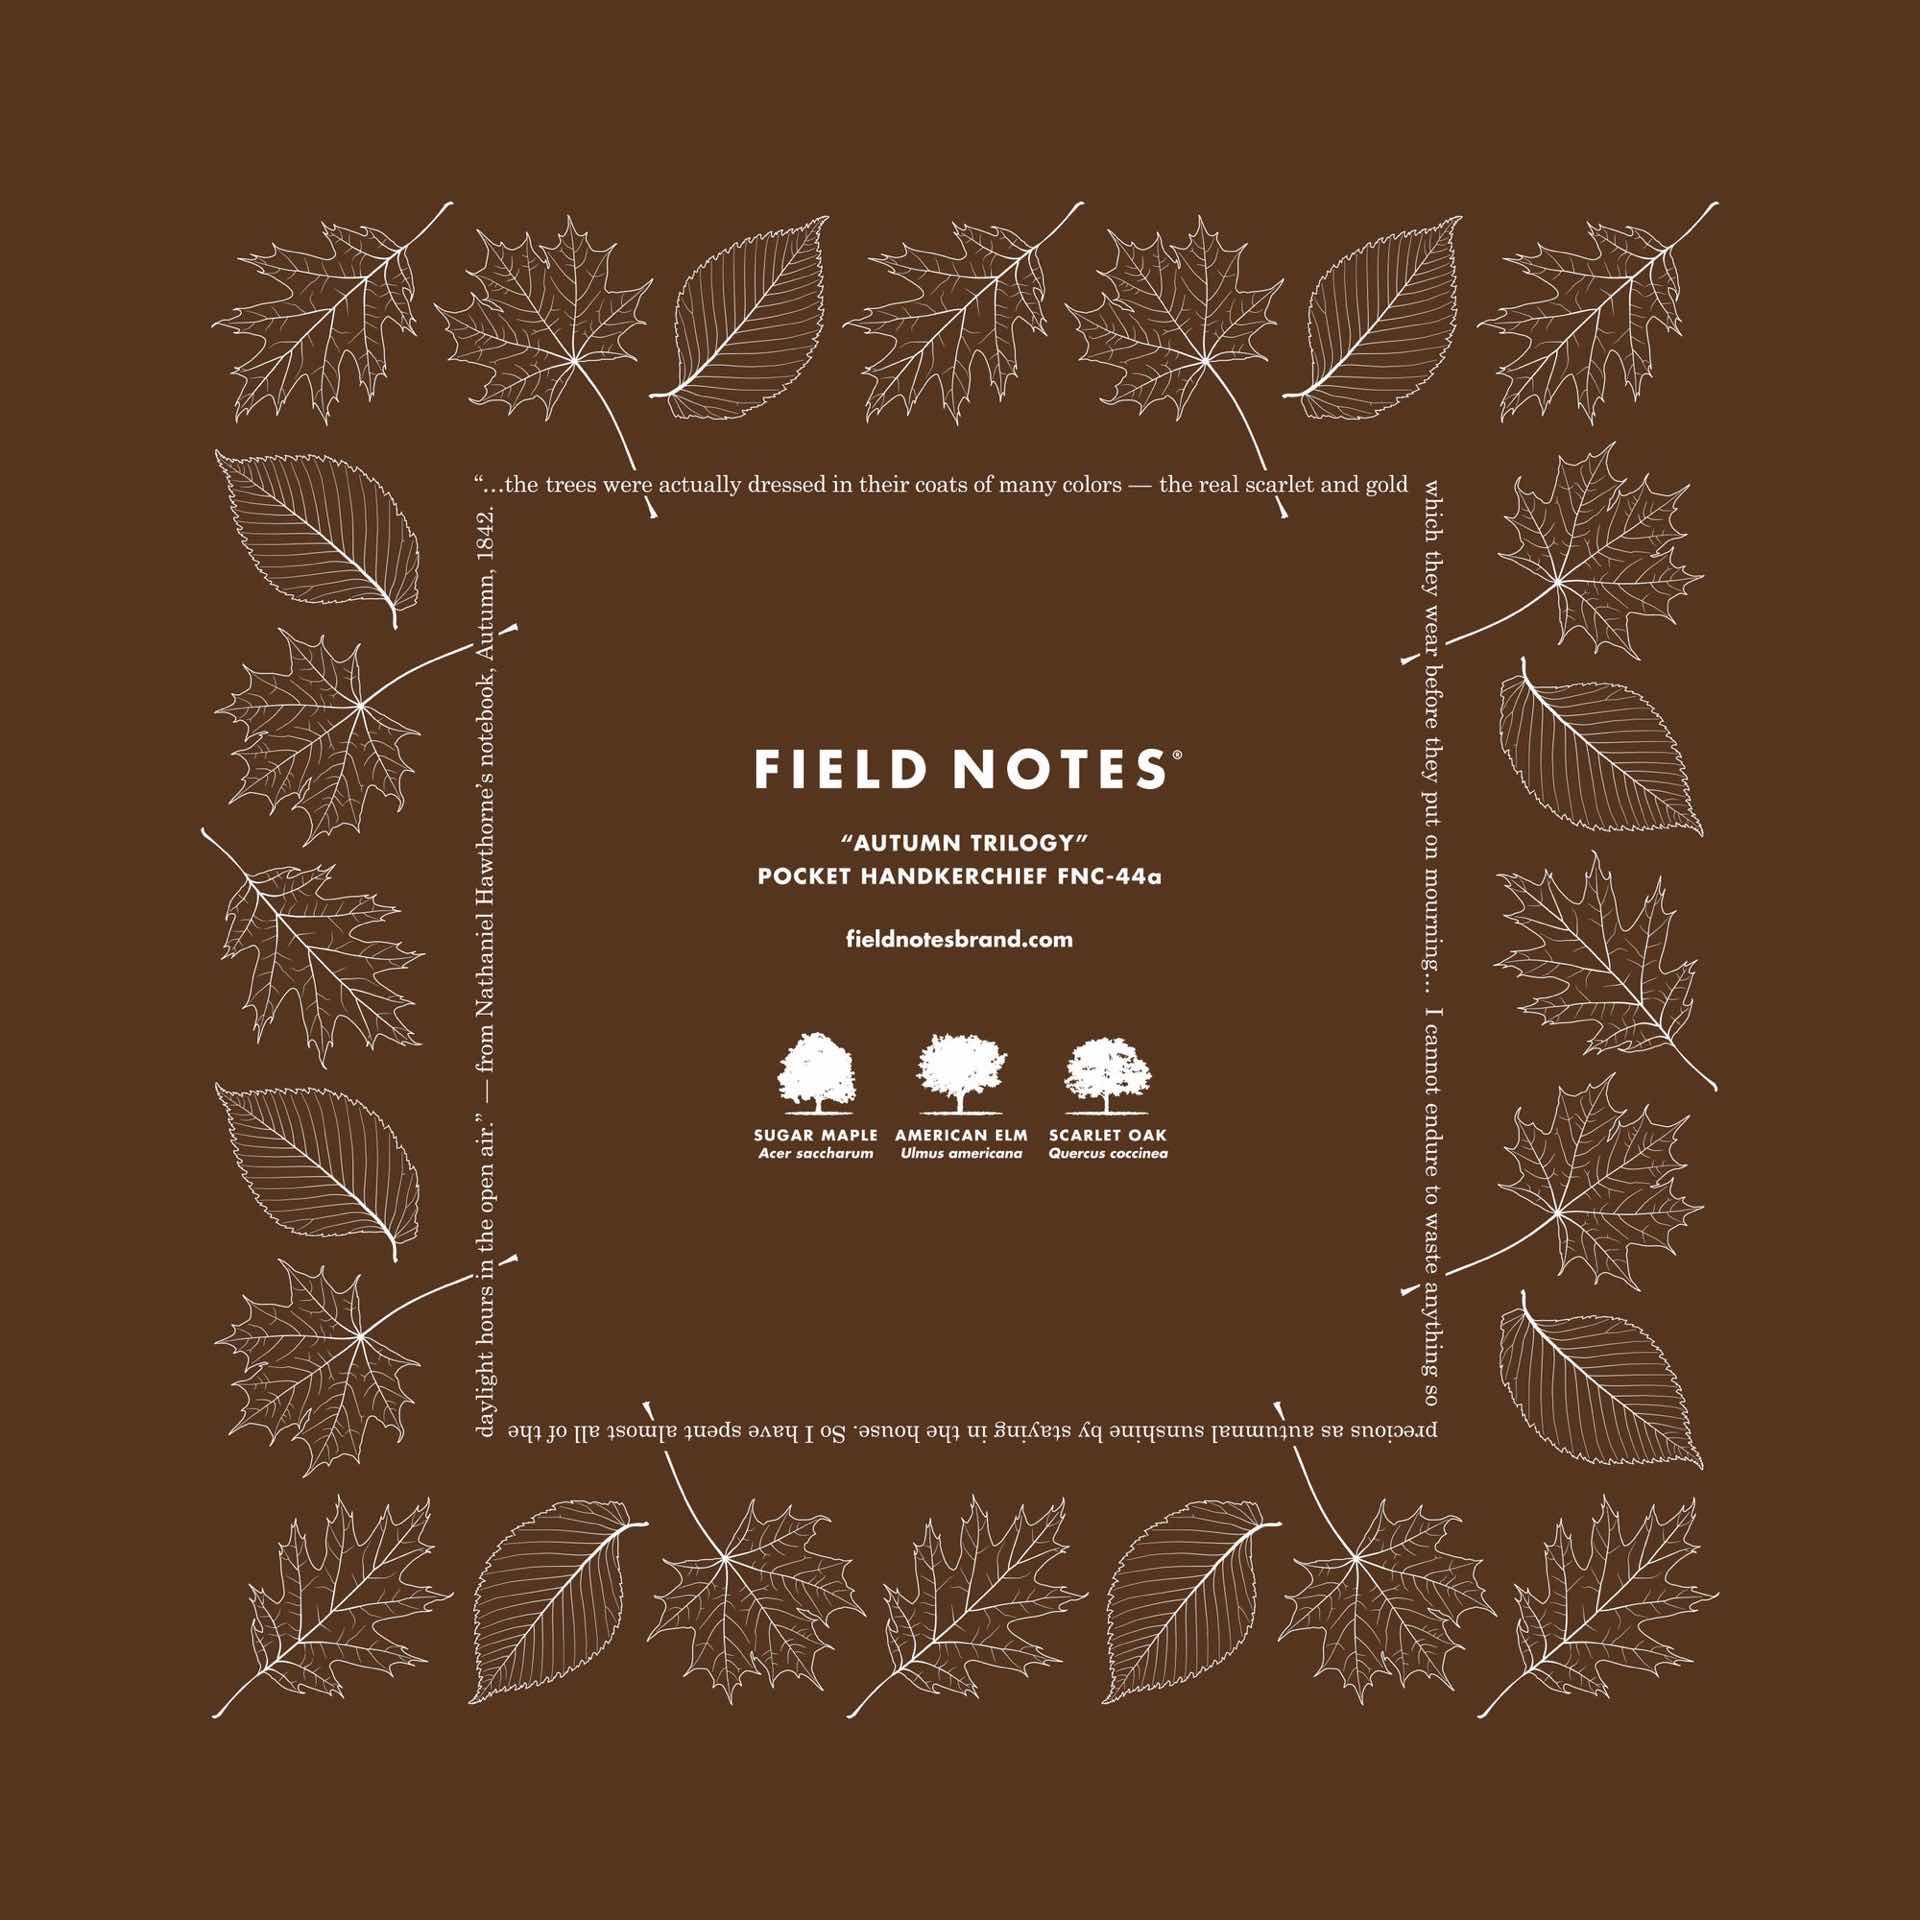 field-notes-autumn-trilogy-edition-bandana